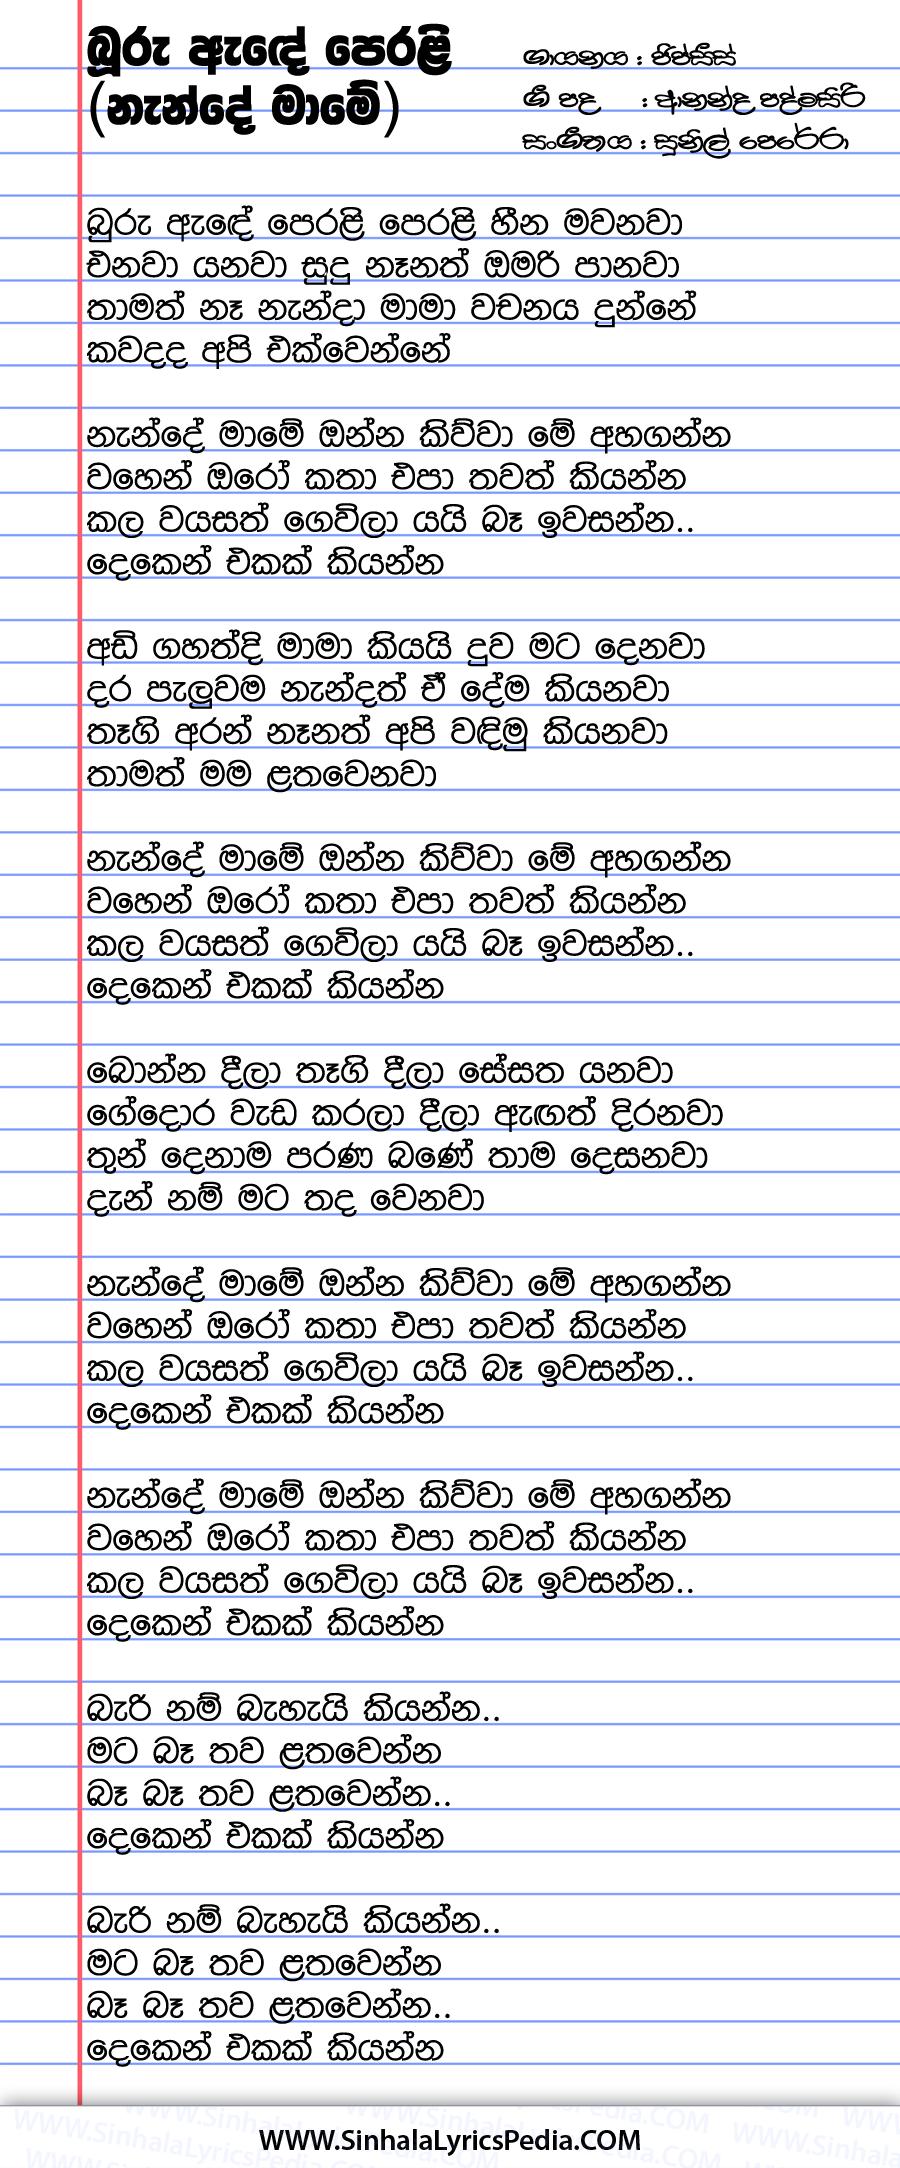 Buru Ande Perali (Nande Mame Onna Keewa) Song Lyrics